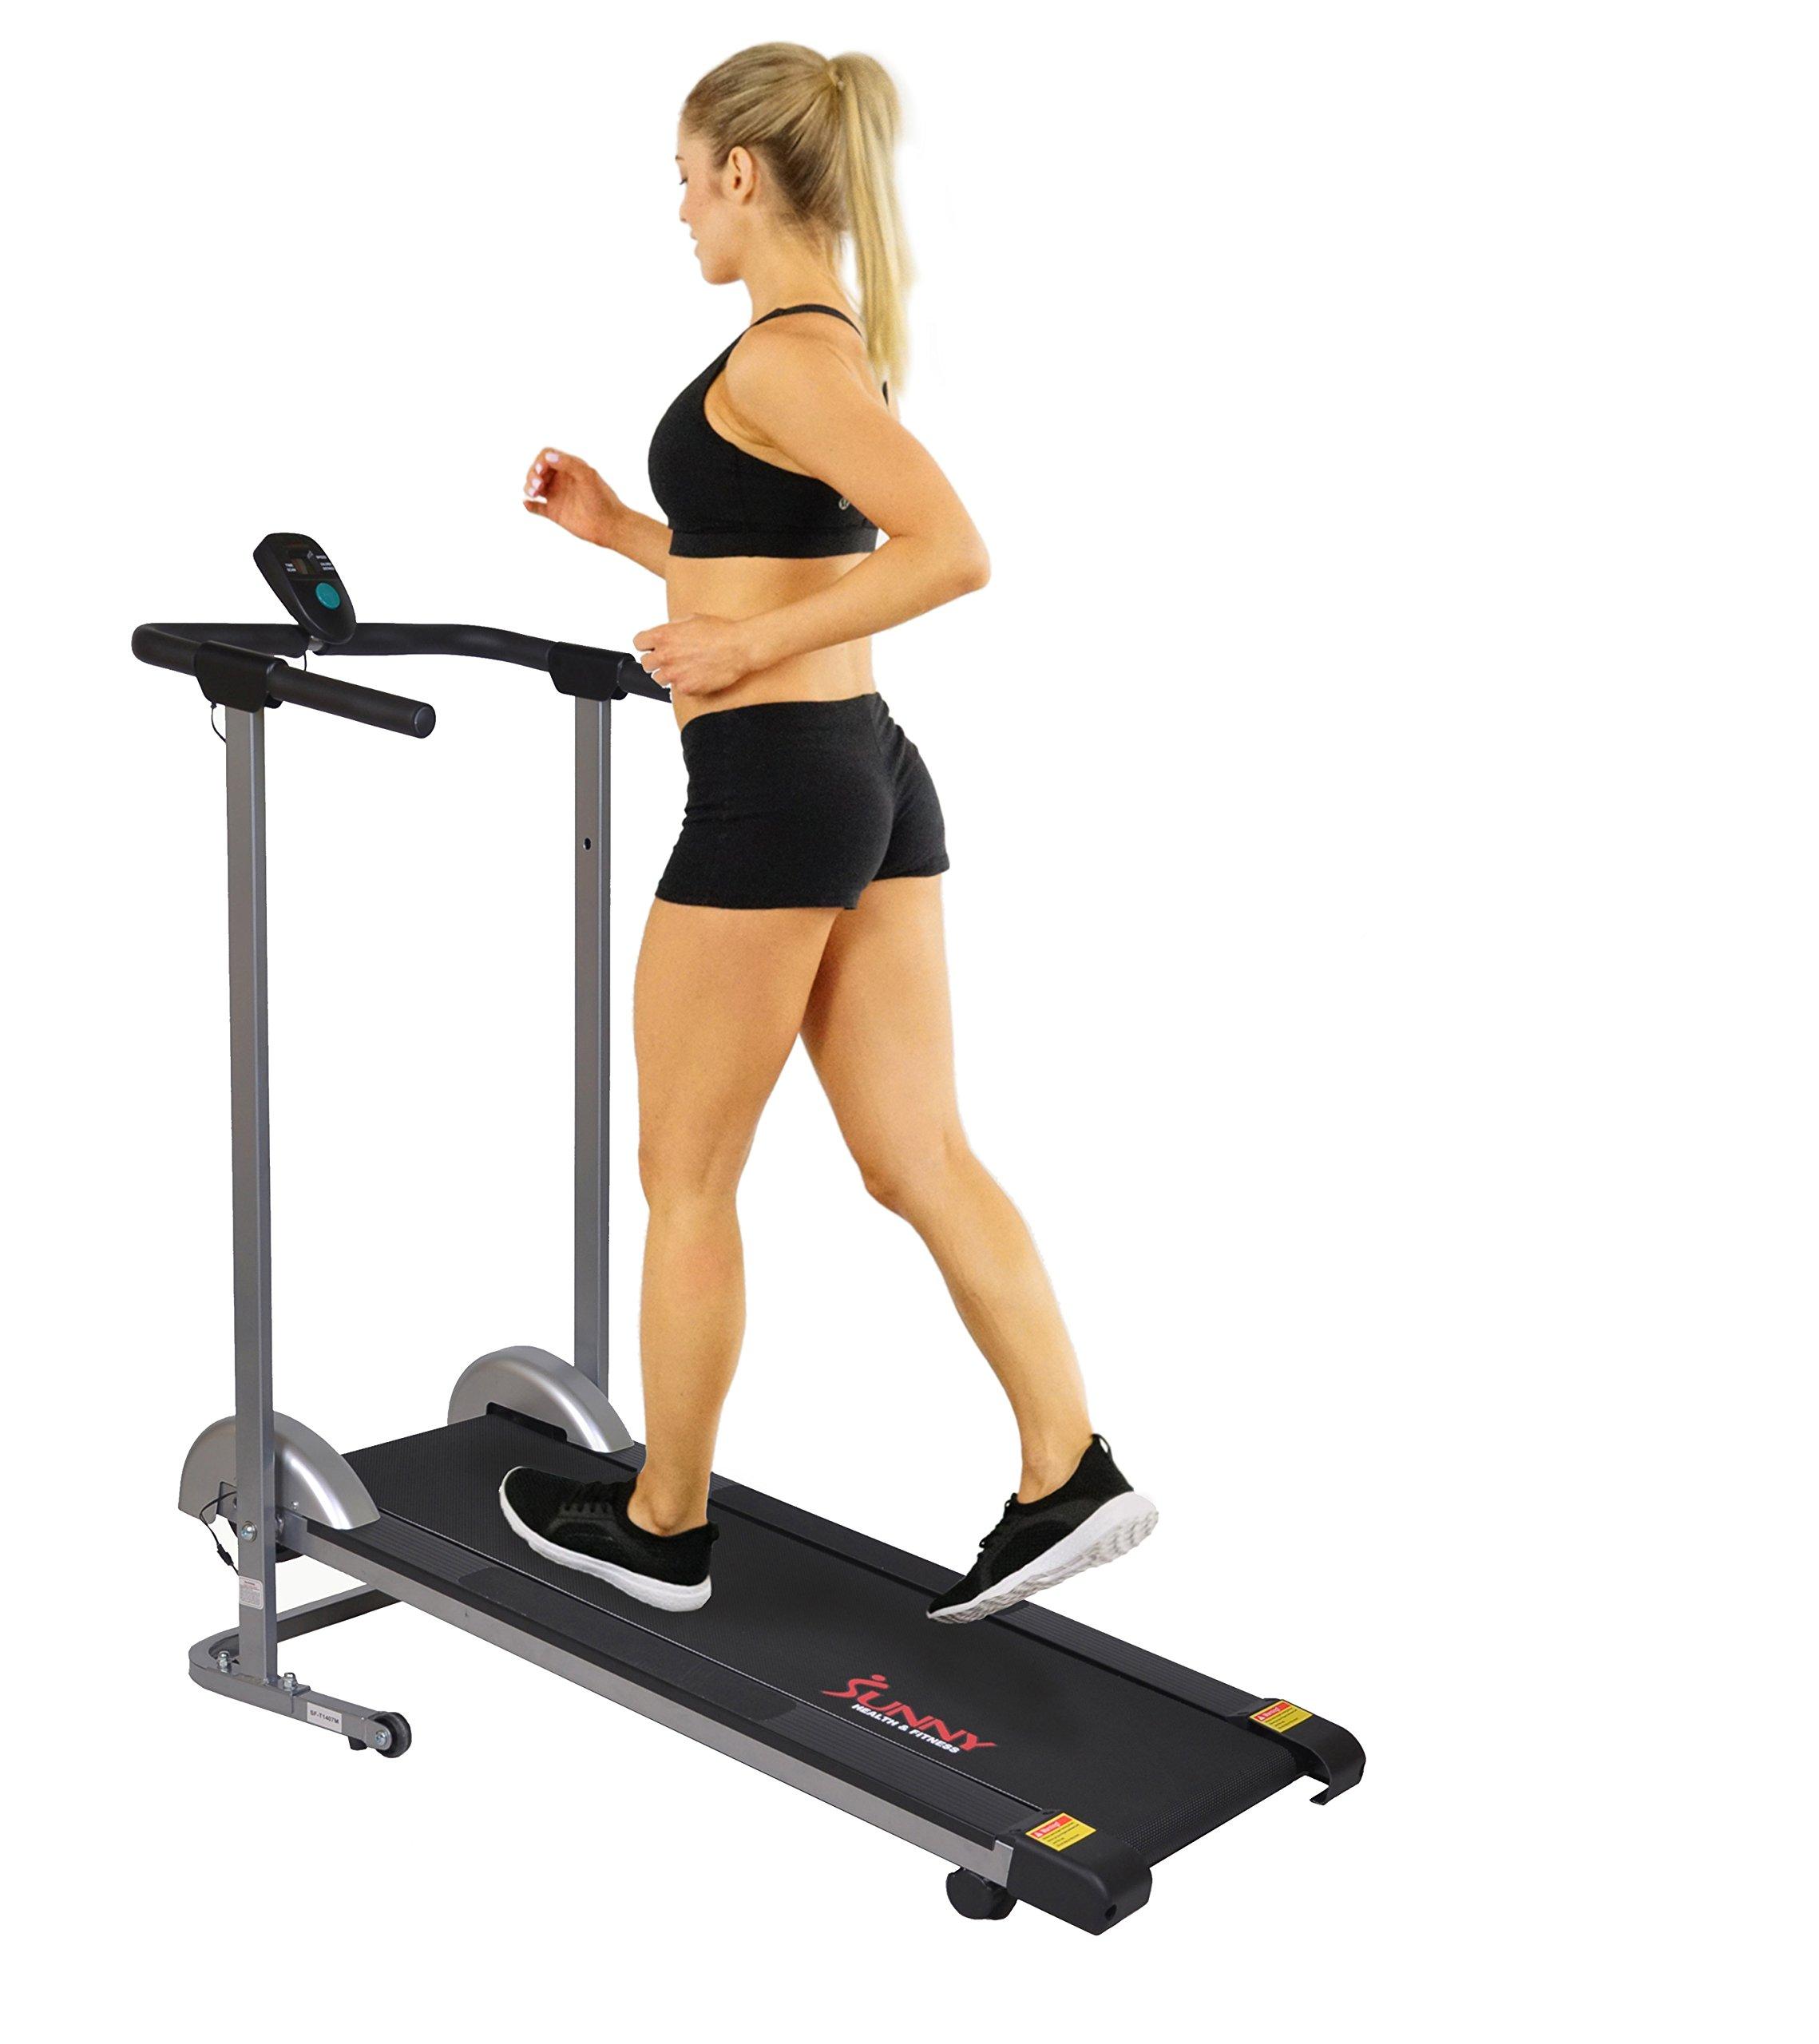 Sunny Health Fitness SF T1407M Treadmill